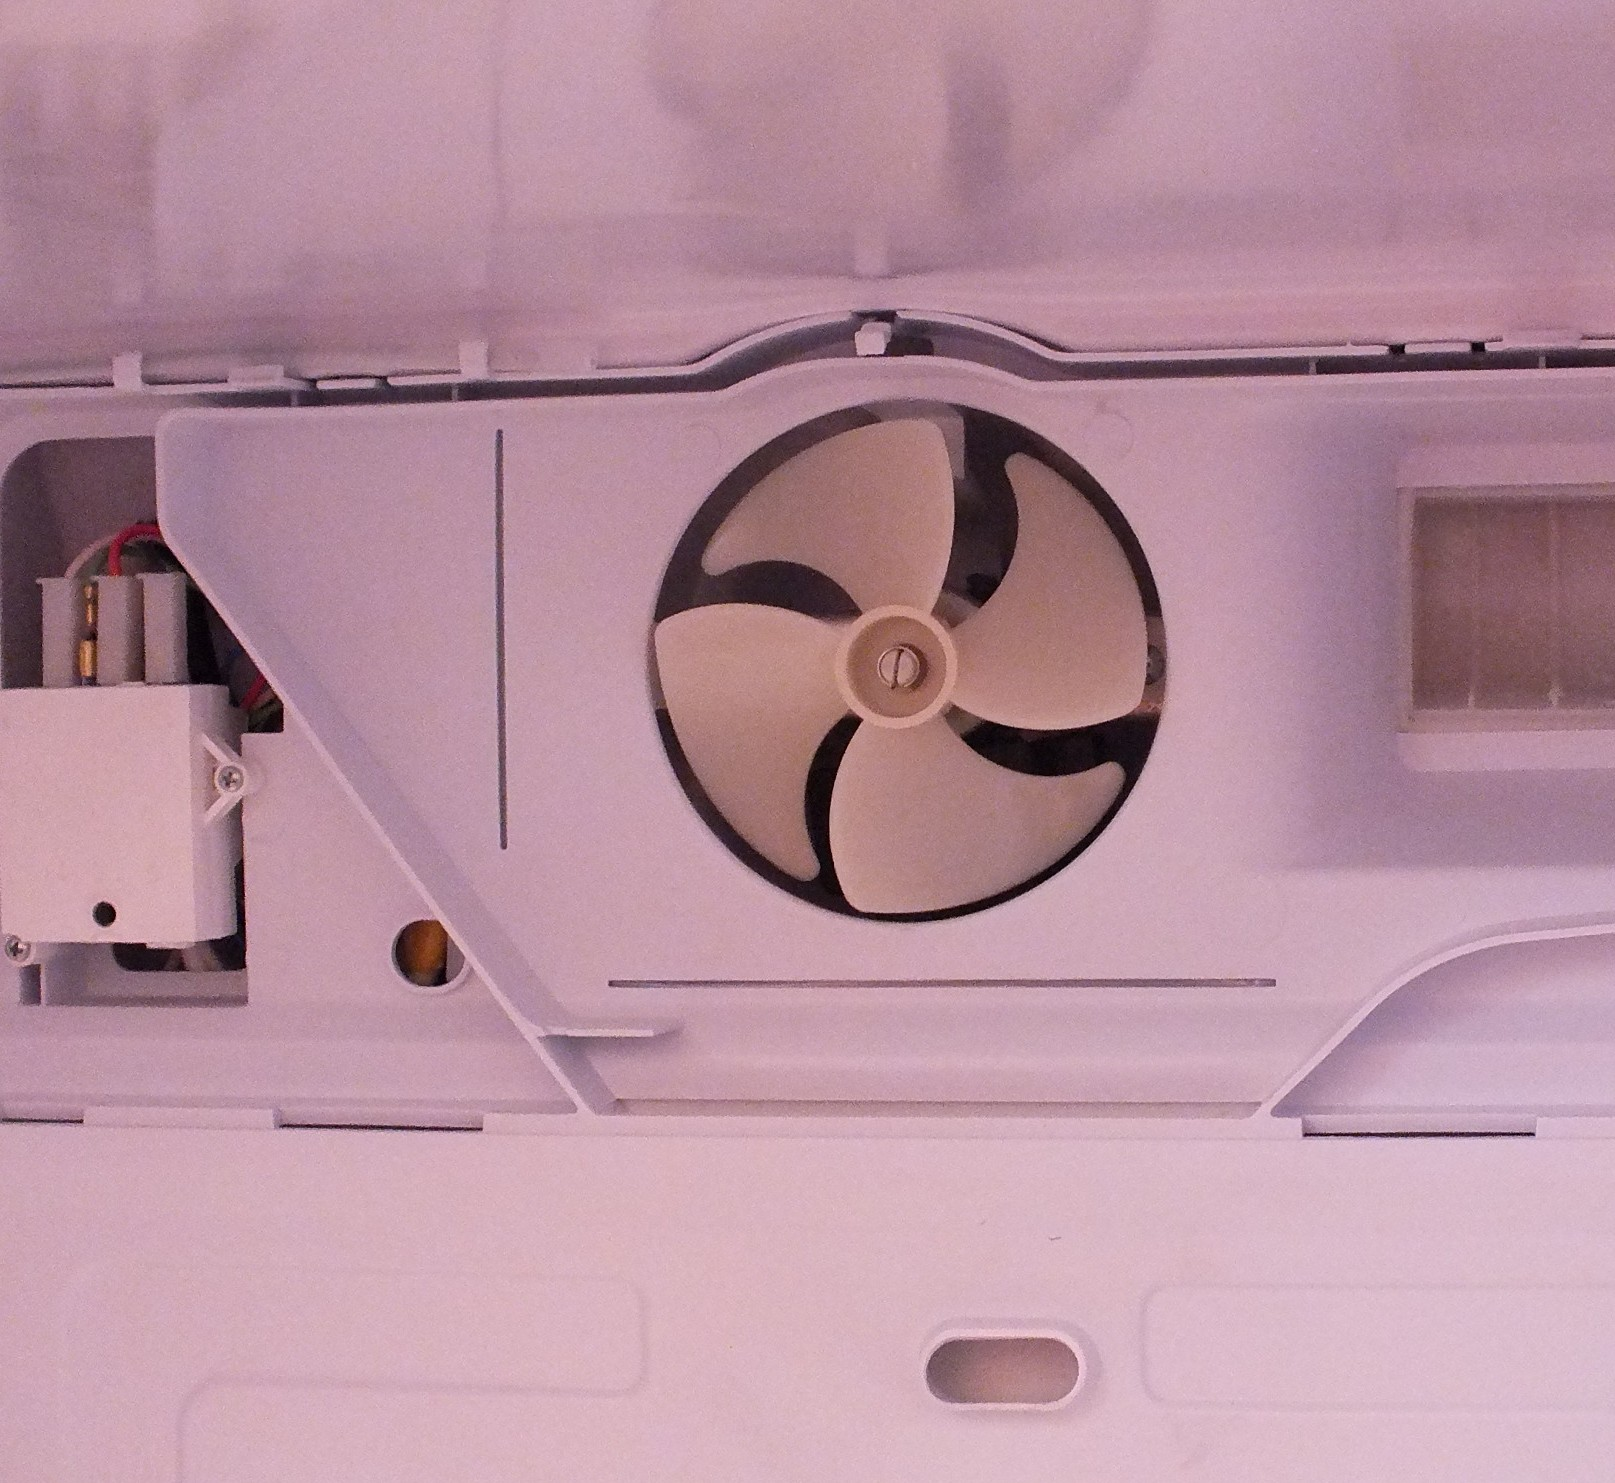 Замена вентилятора холодильника индезит своими руками